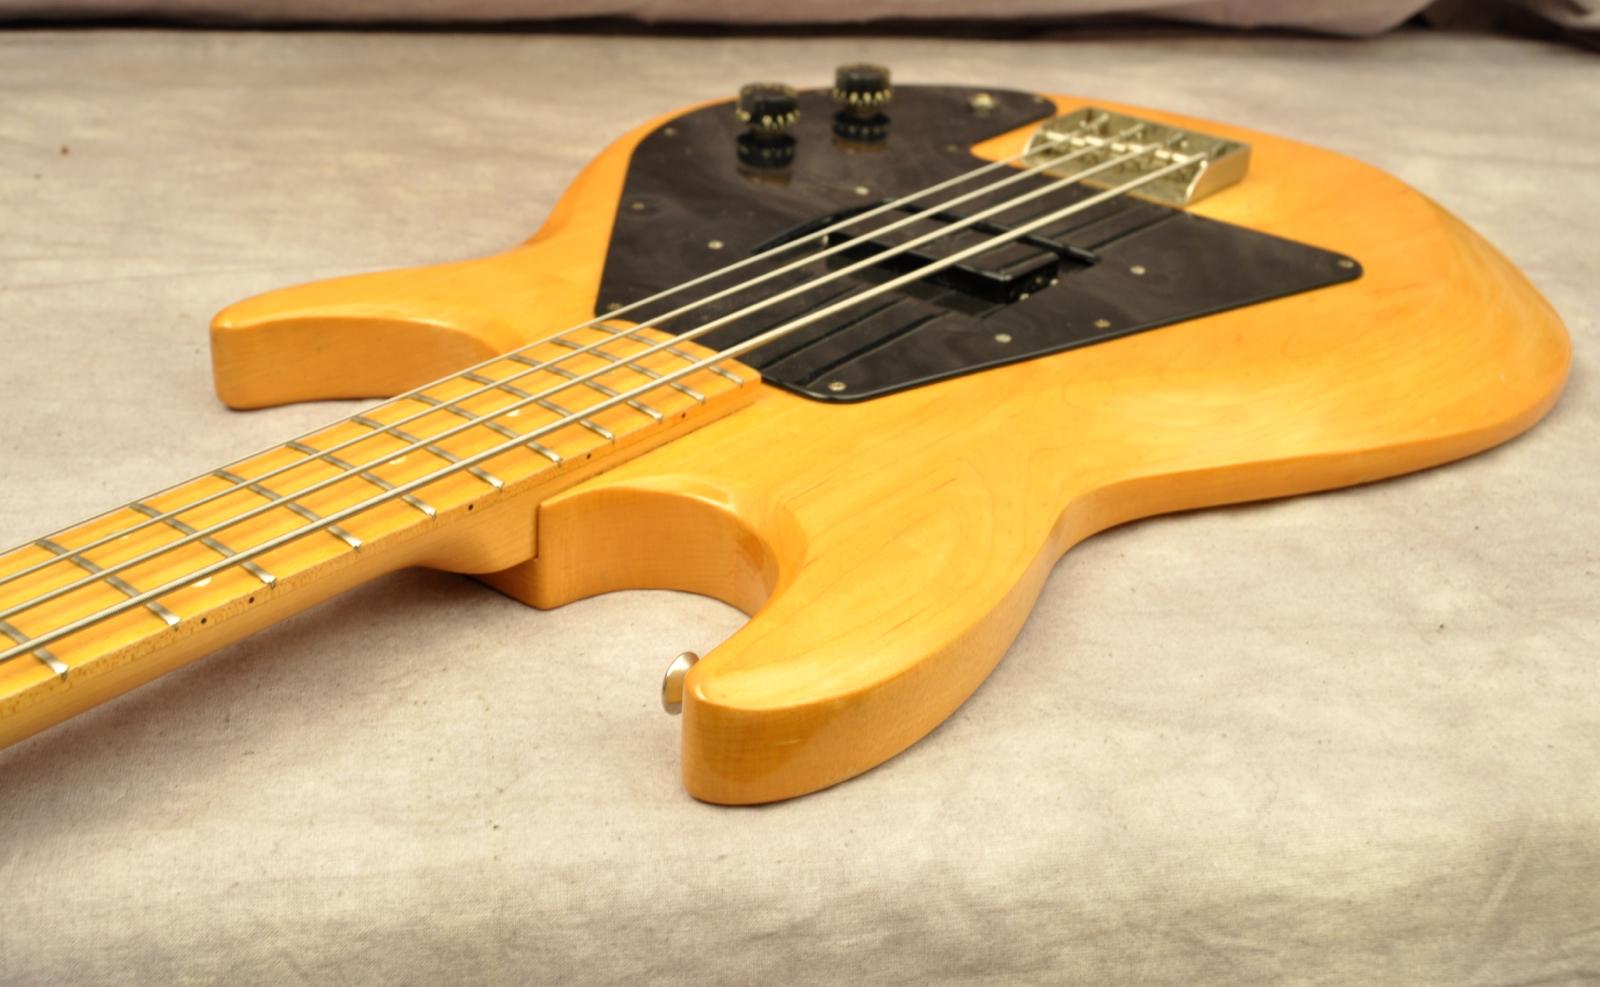 gibson grabber 1979 natural bass for sale andy baxter bass guitars ltd. Black Bedroom Furniture Sets. Home Design Ideas